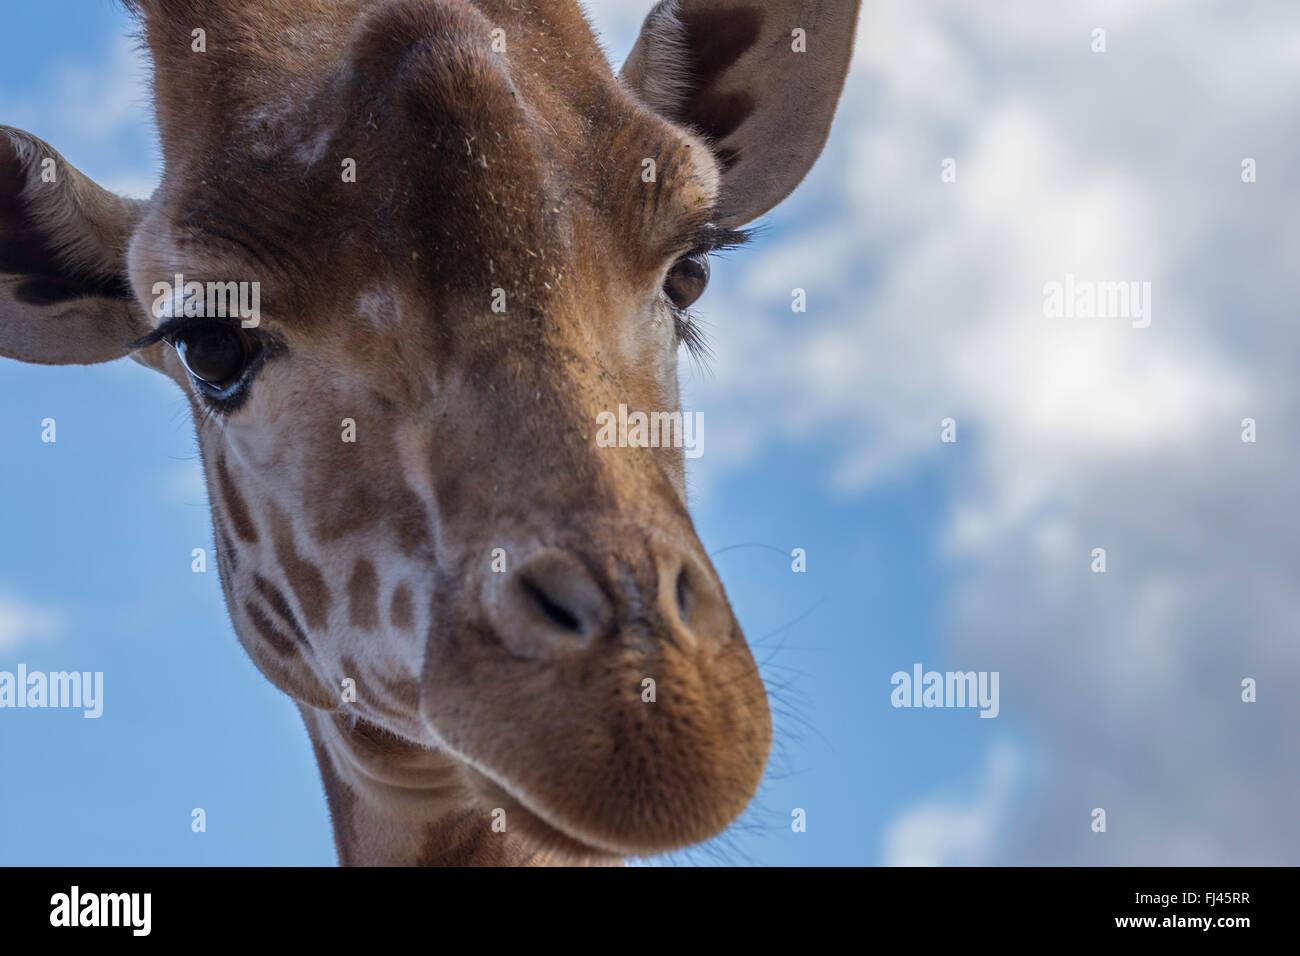 Una preciosa jirafa arriba cerrar Imagen De Stock